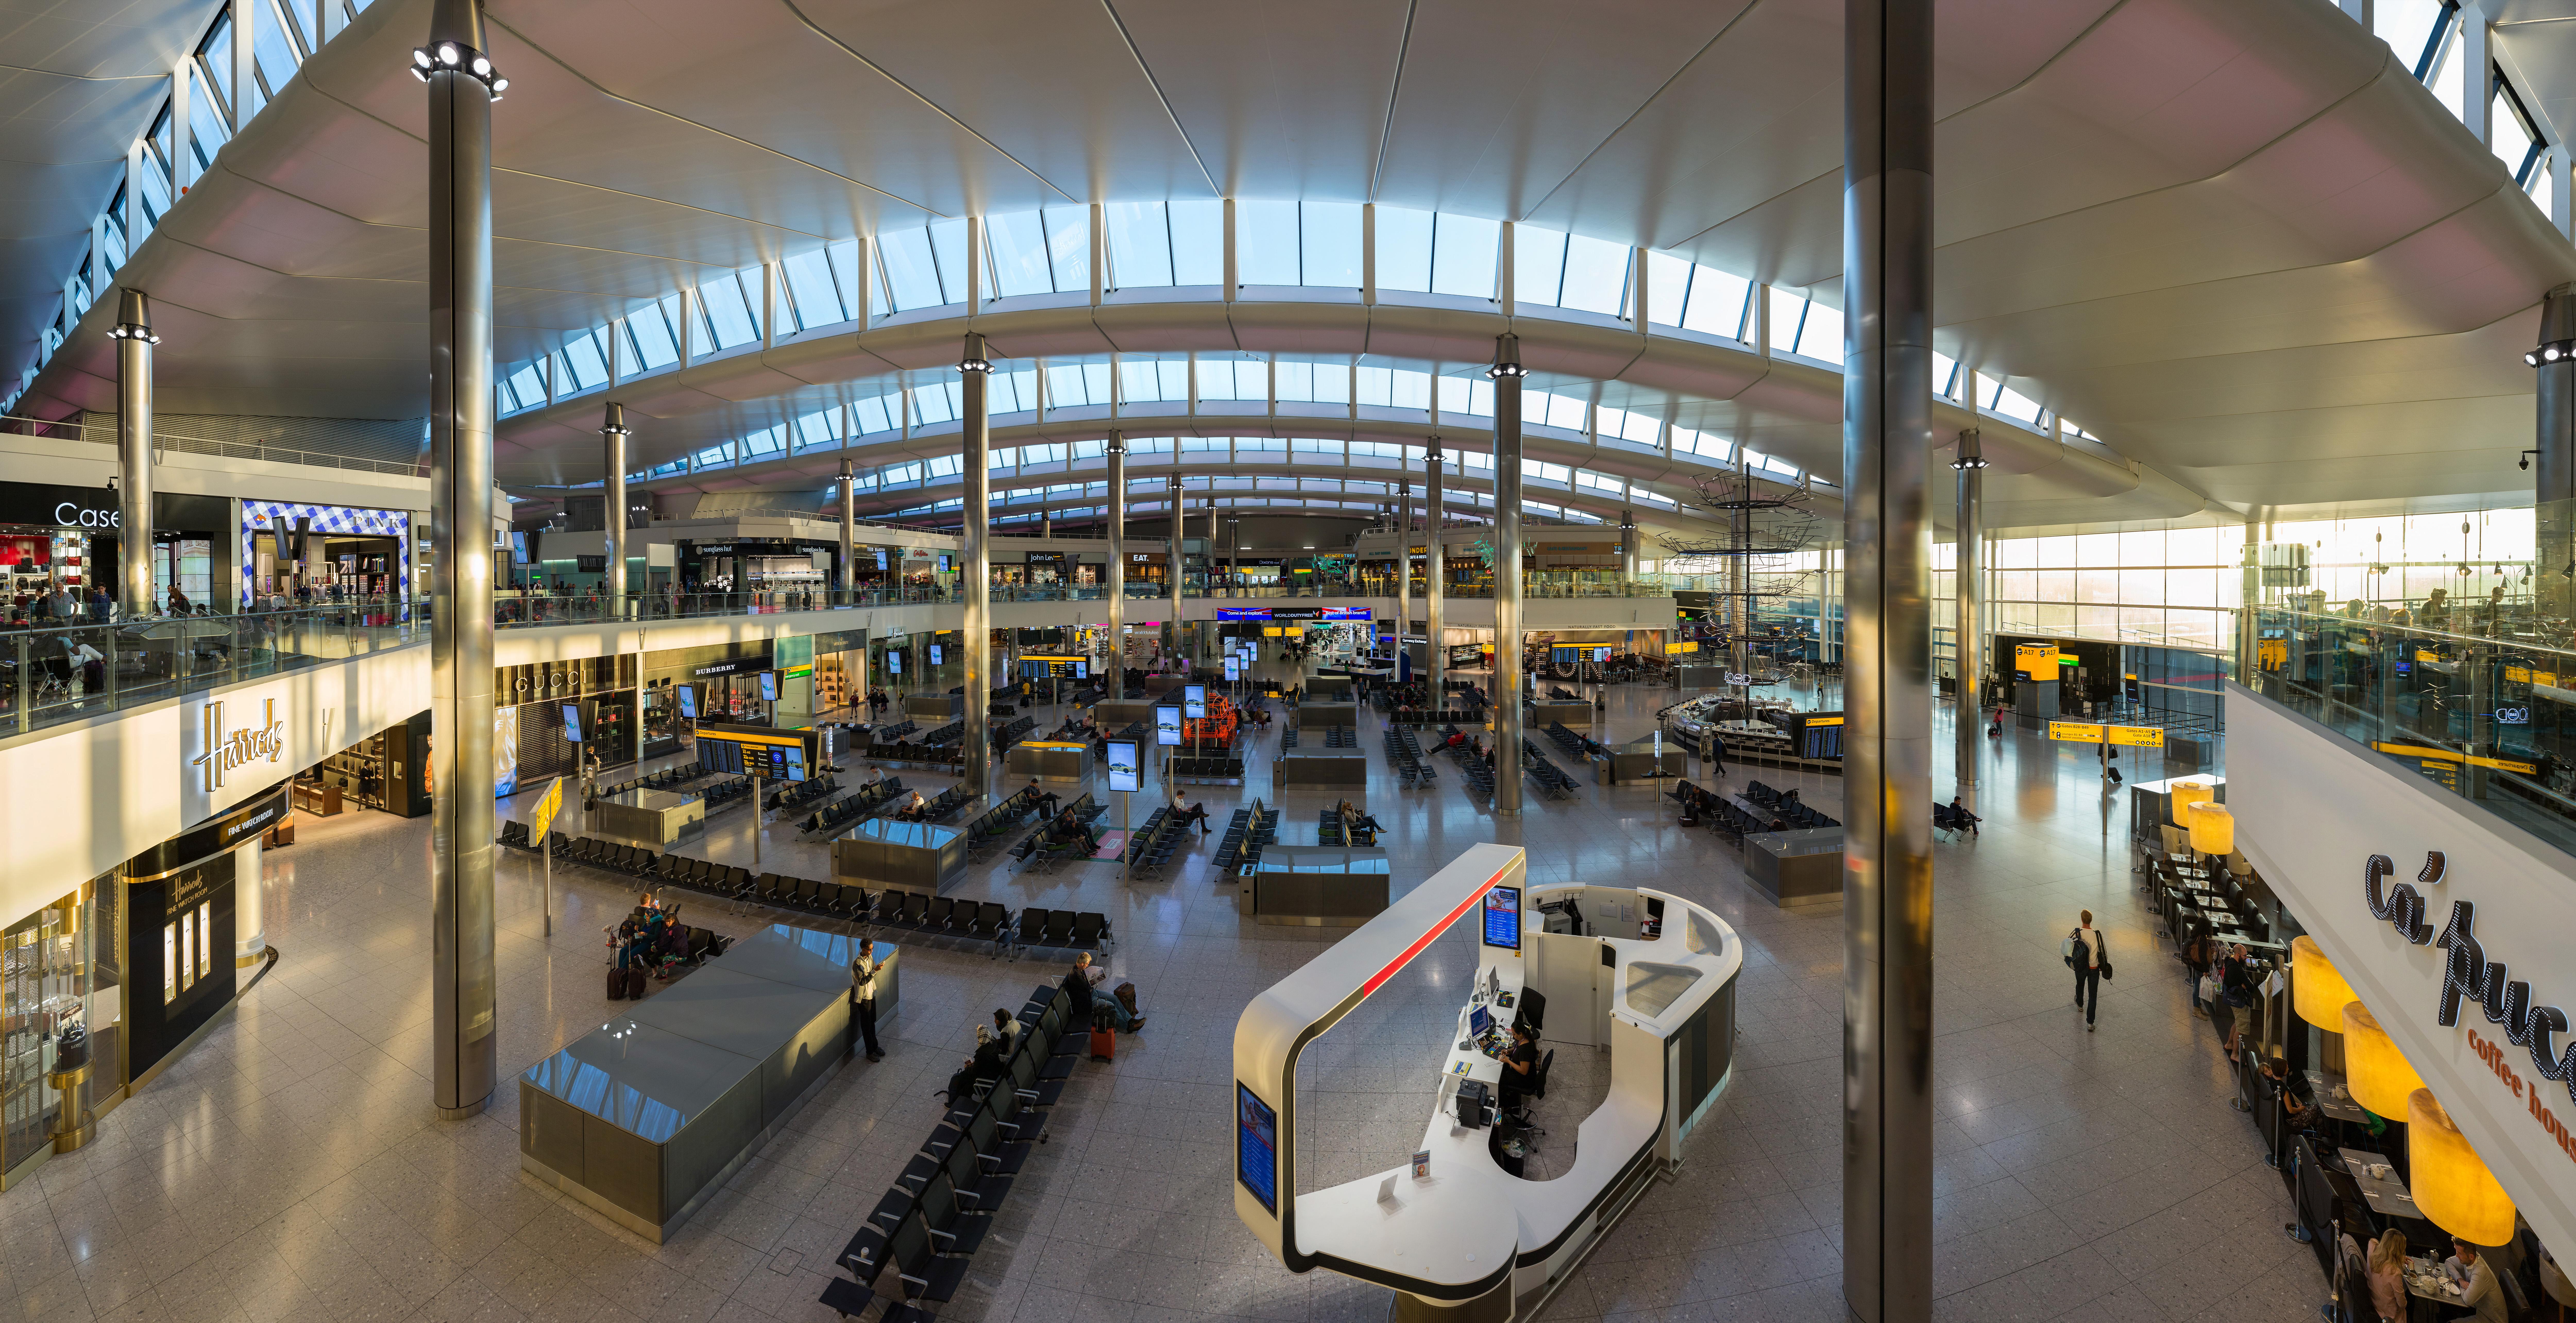 Heathrow Airport Terminal 2